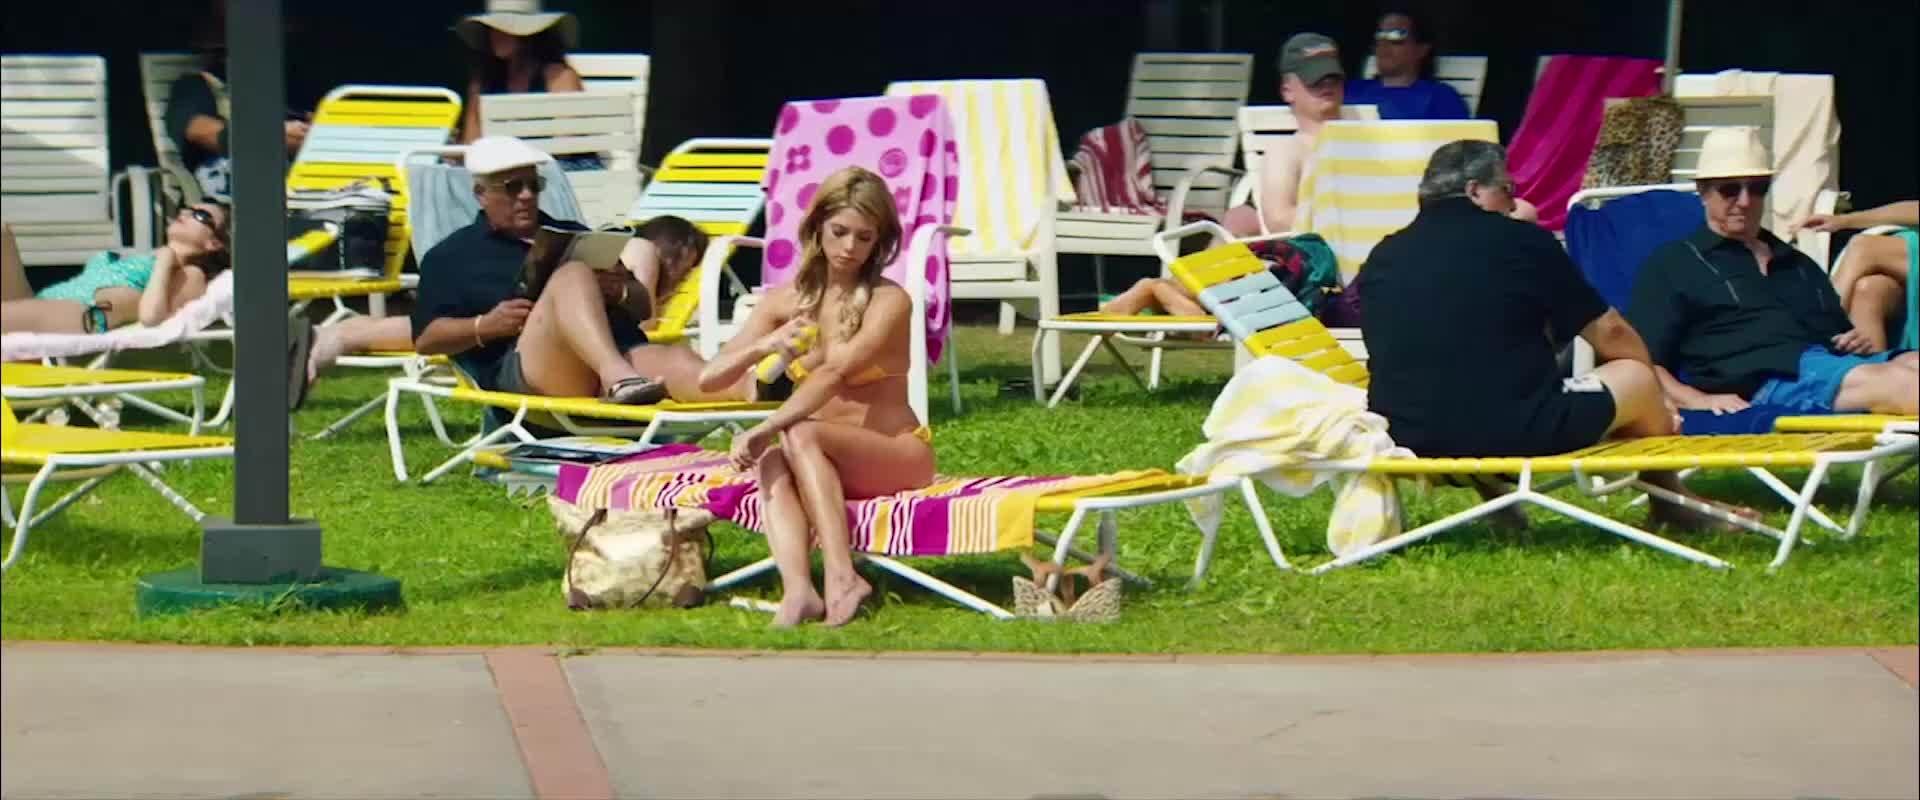 AshleyGreene, celebs, Ashley Greene GIFs